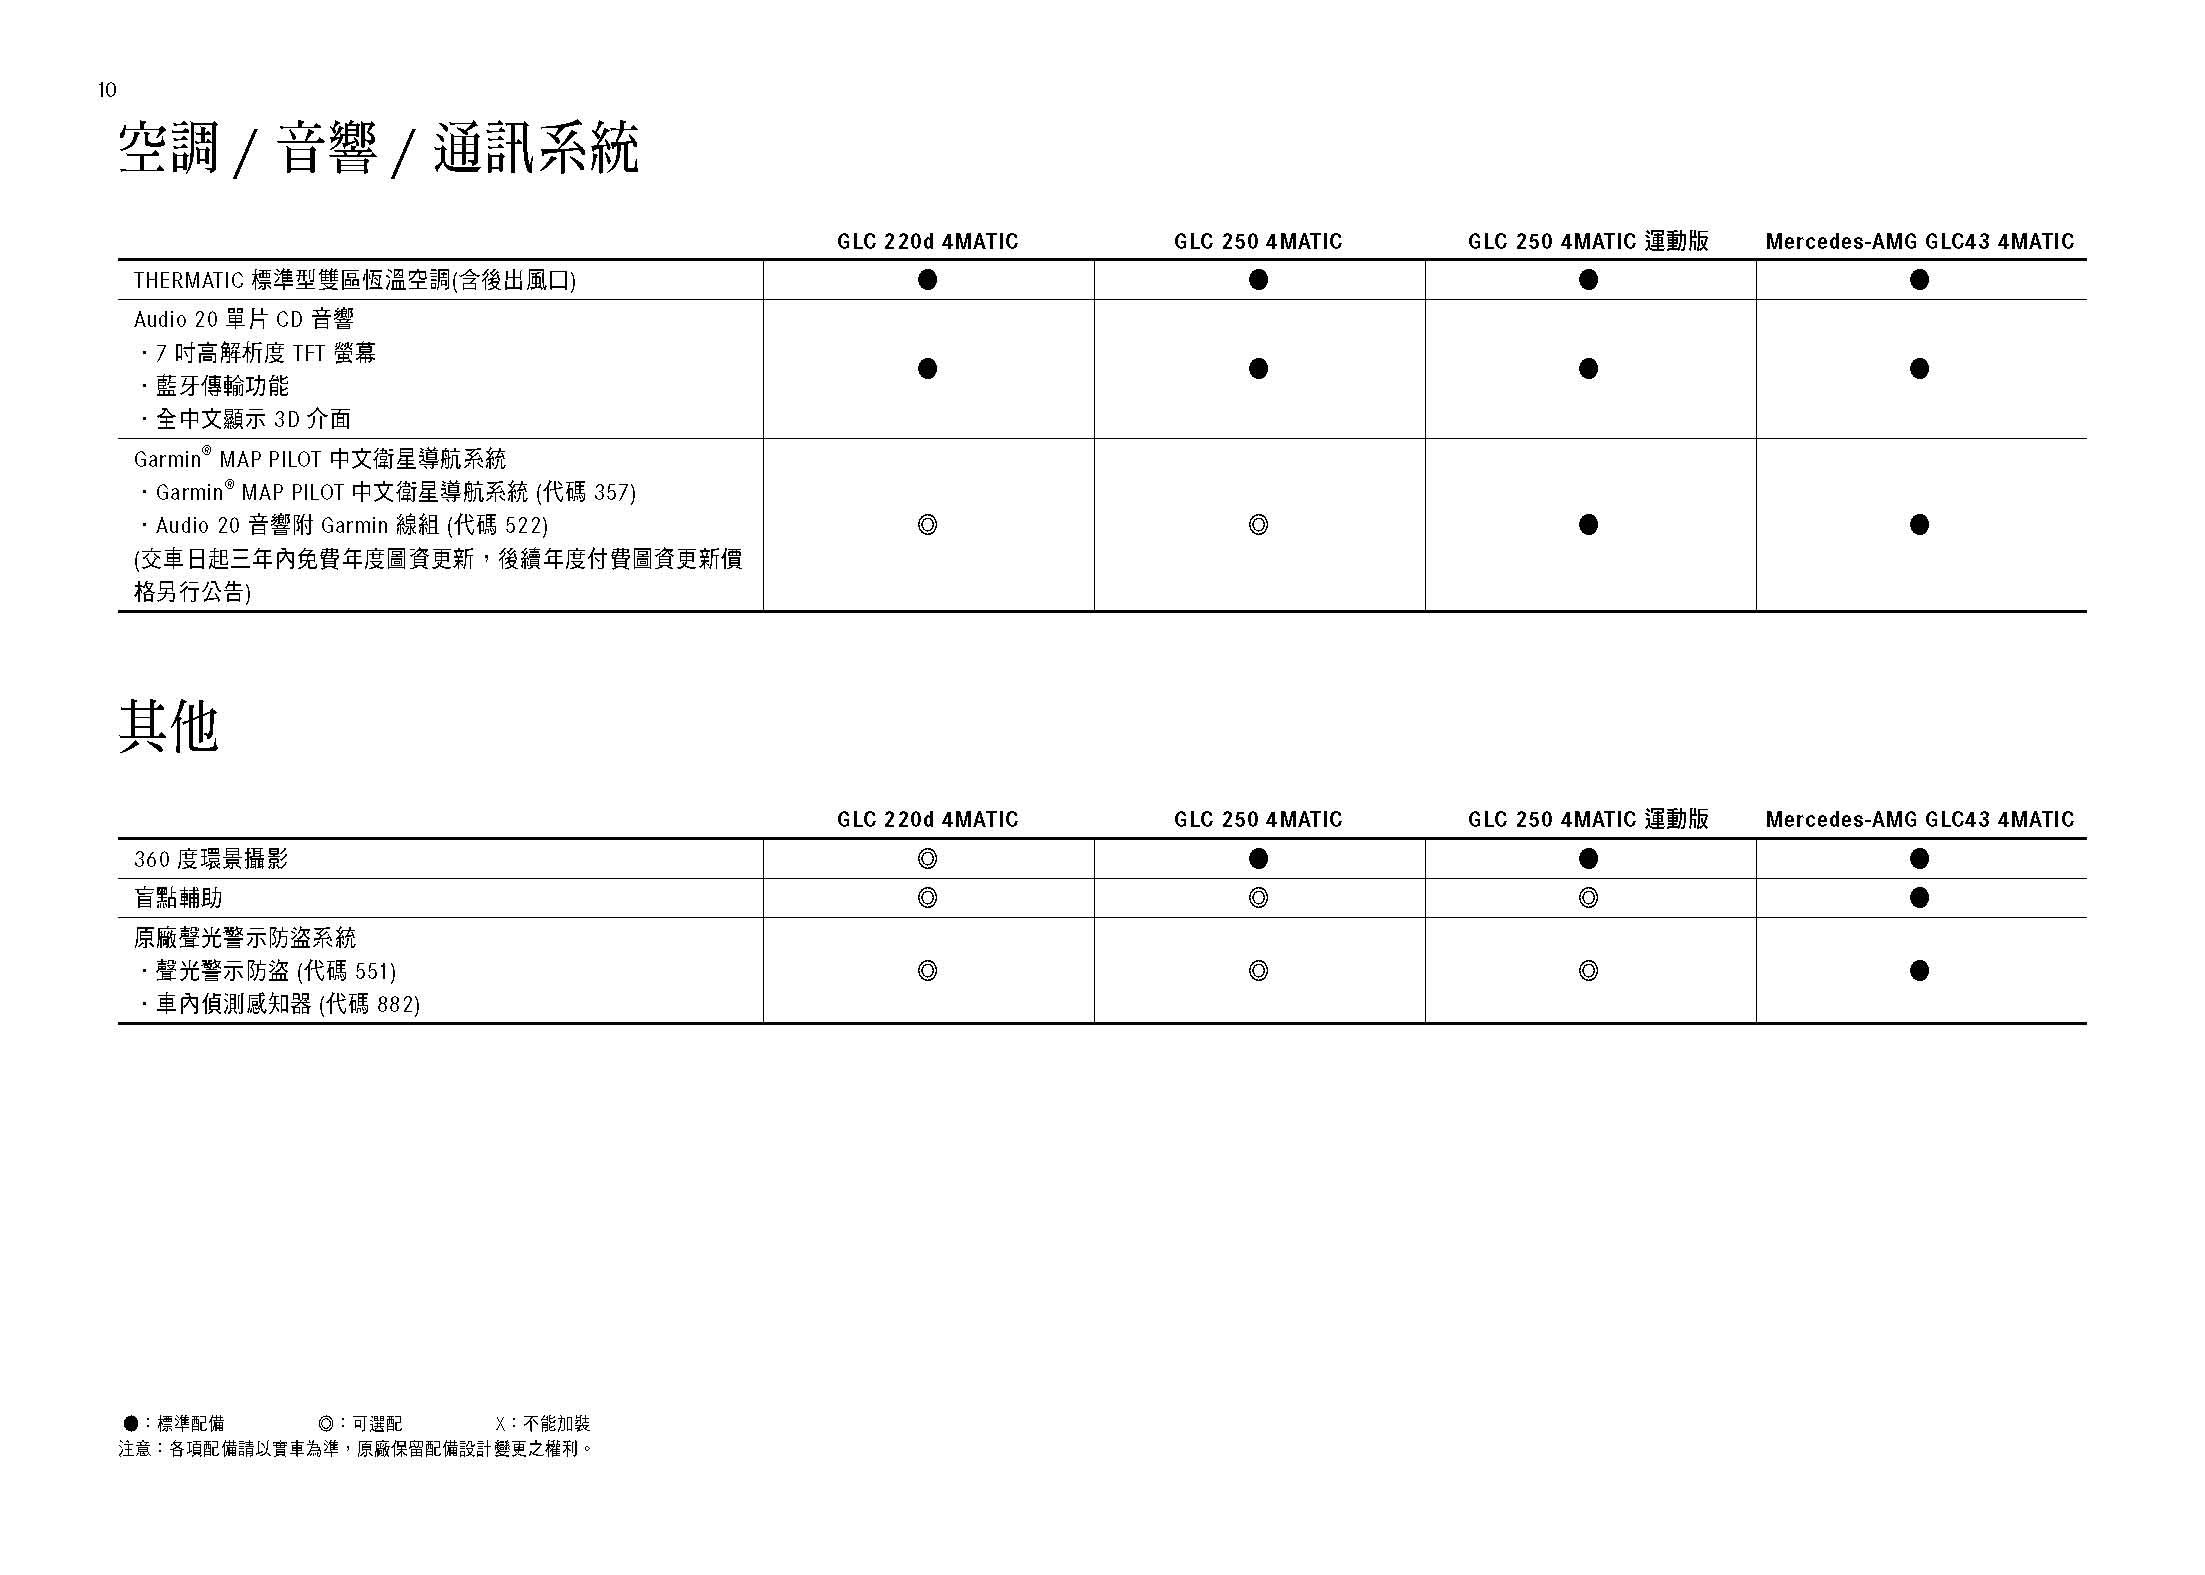 MY1718_GLC規格配備表20170929_頁面_10